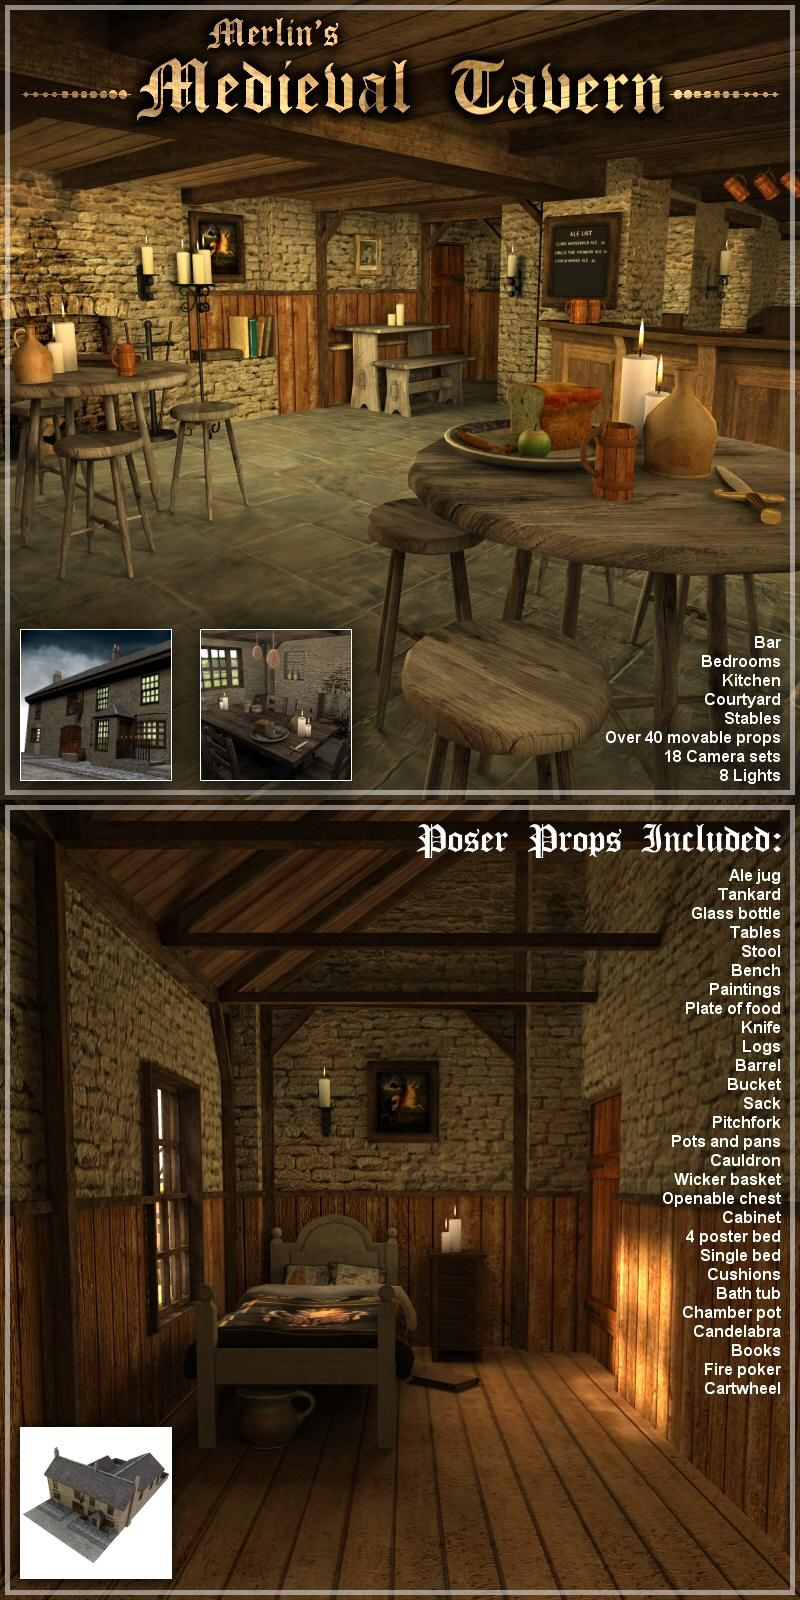 Medieval Bedroom Merlins Medieval Tavern Home Projects Dining Room Pinterest